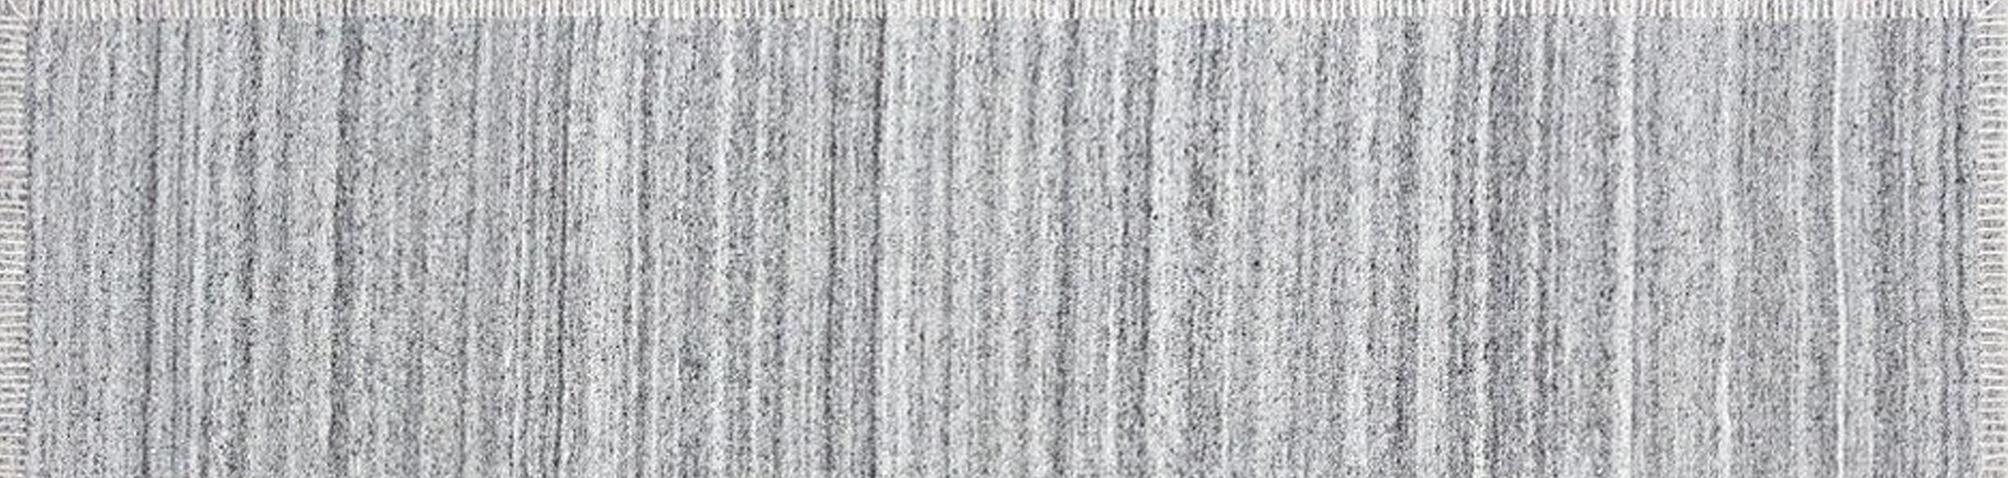 RUG 2 The nevada rug Luumo grey nursery room, sydney interior design styling.jpg